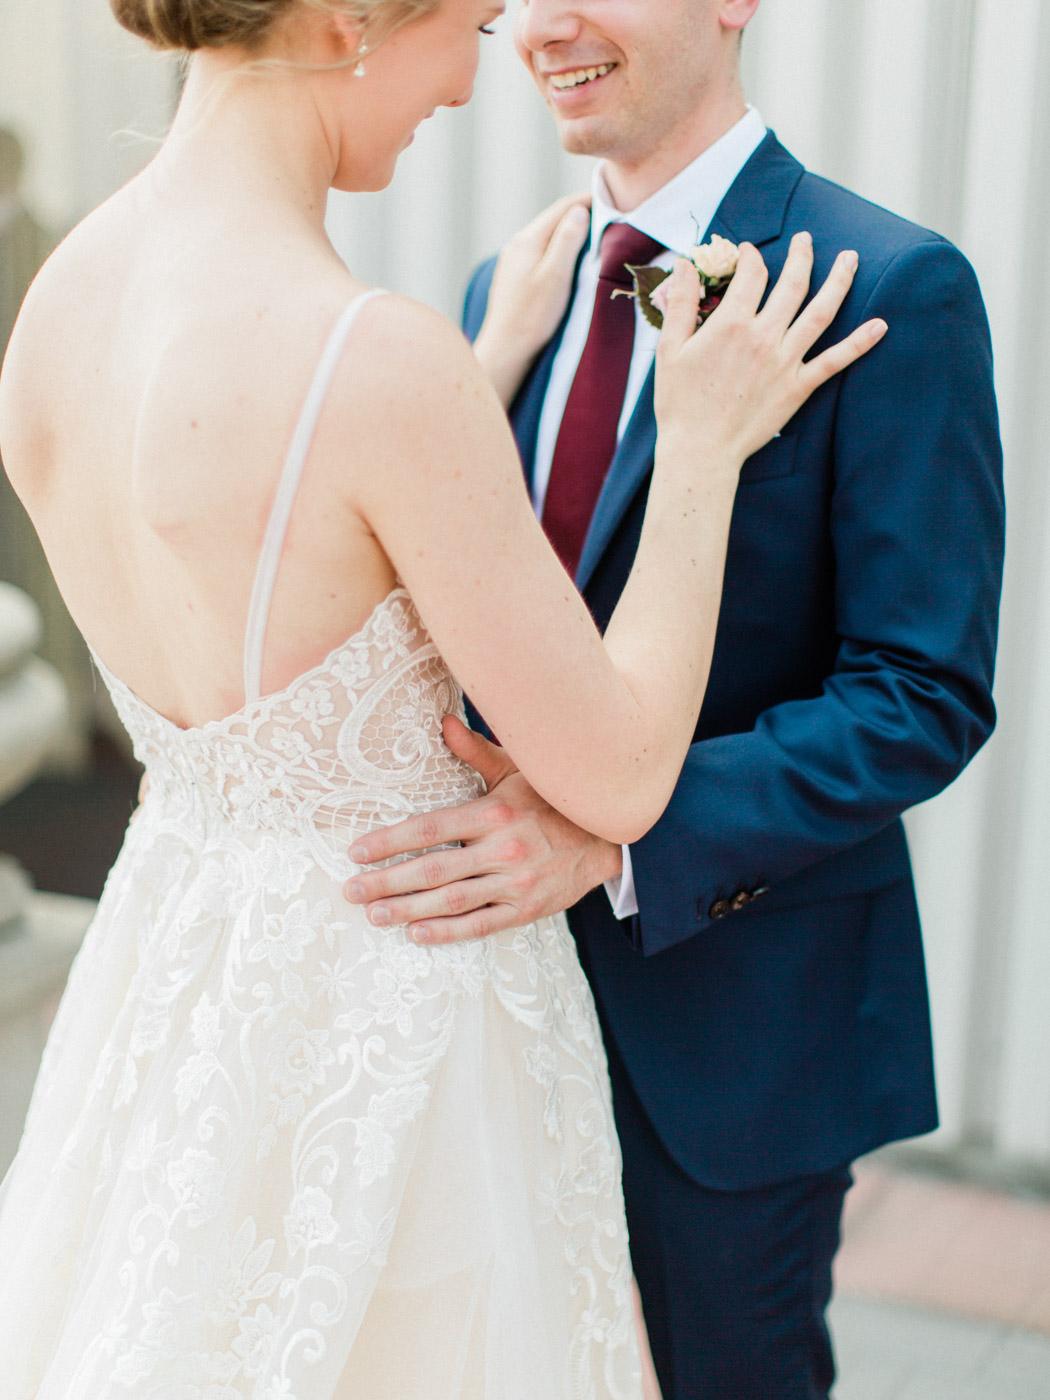 downtown-toronto-wedding-photographer-berkley-fieldhouse-blush-168.jpg